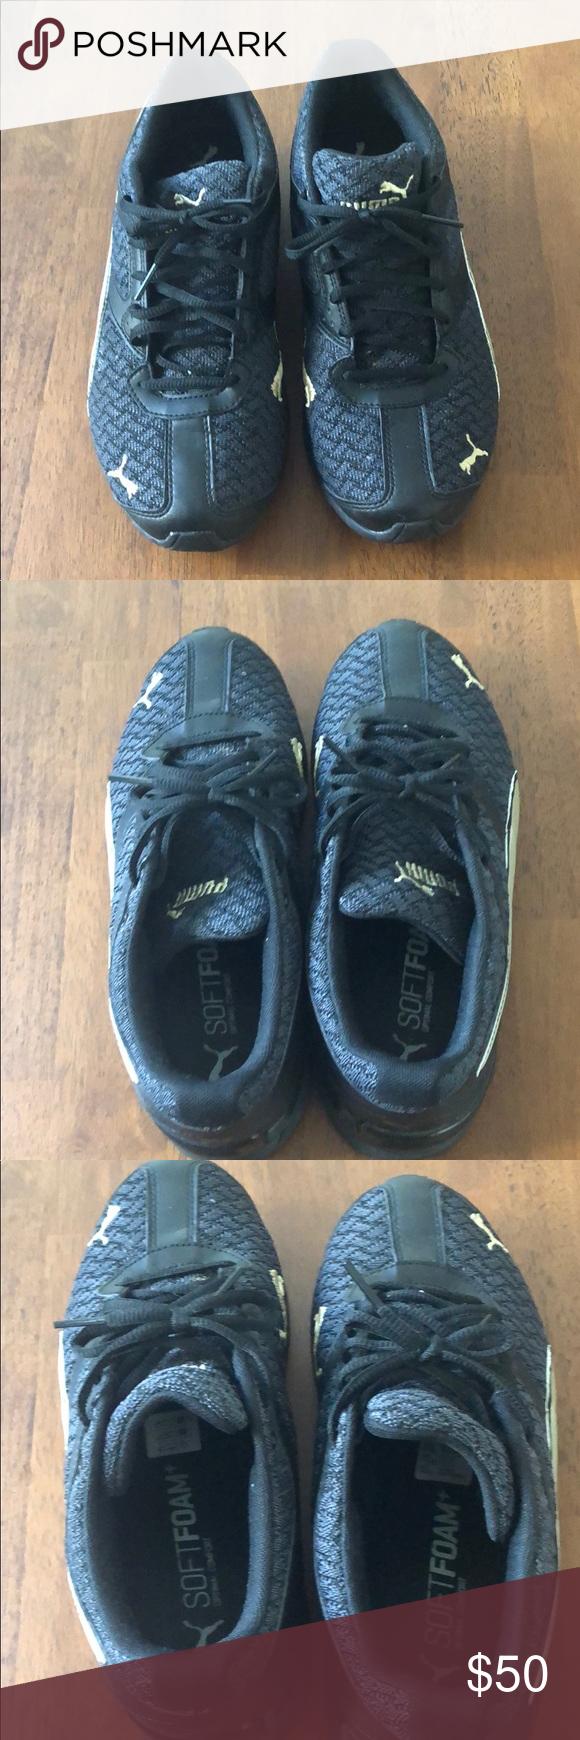 Ladies Puma Soft Foam Sneakers 8.5